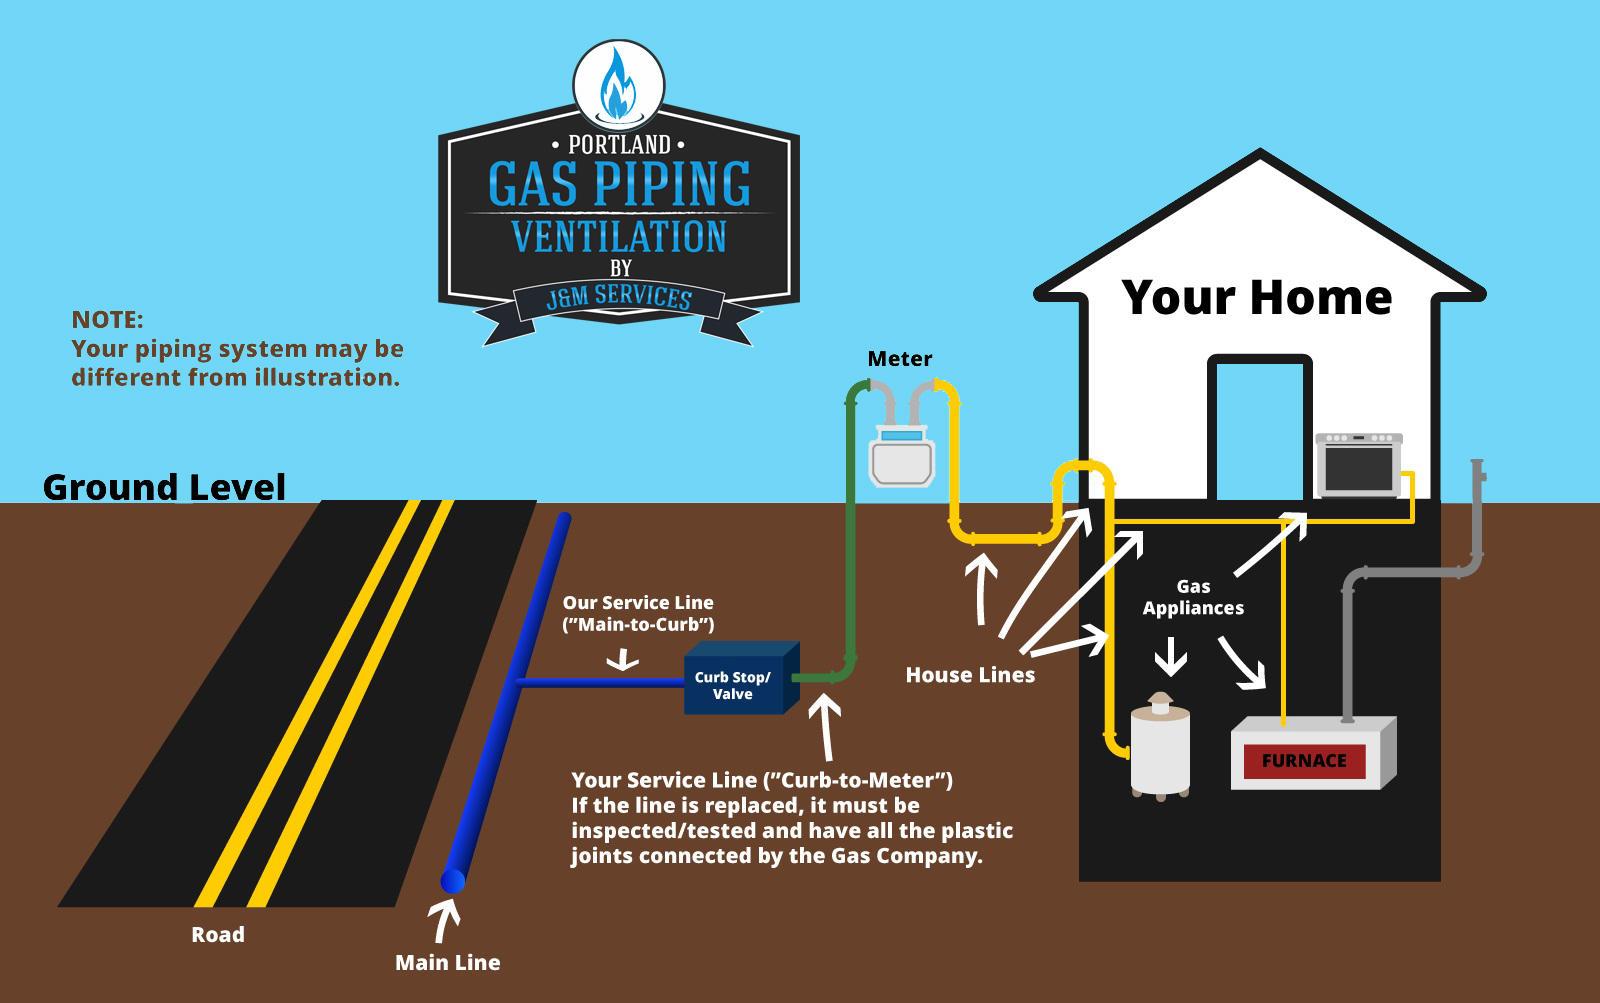 Portland Gas Piping image 1